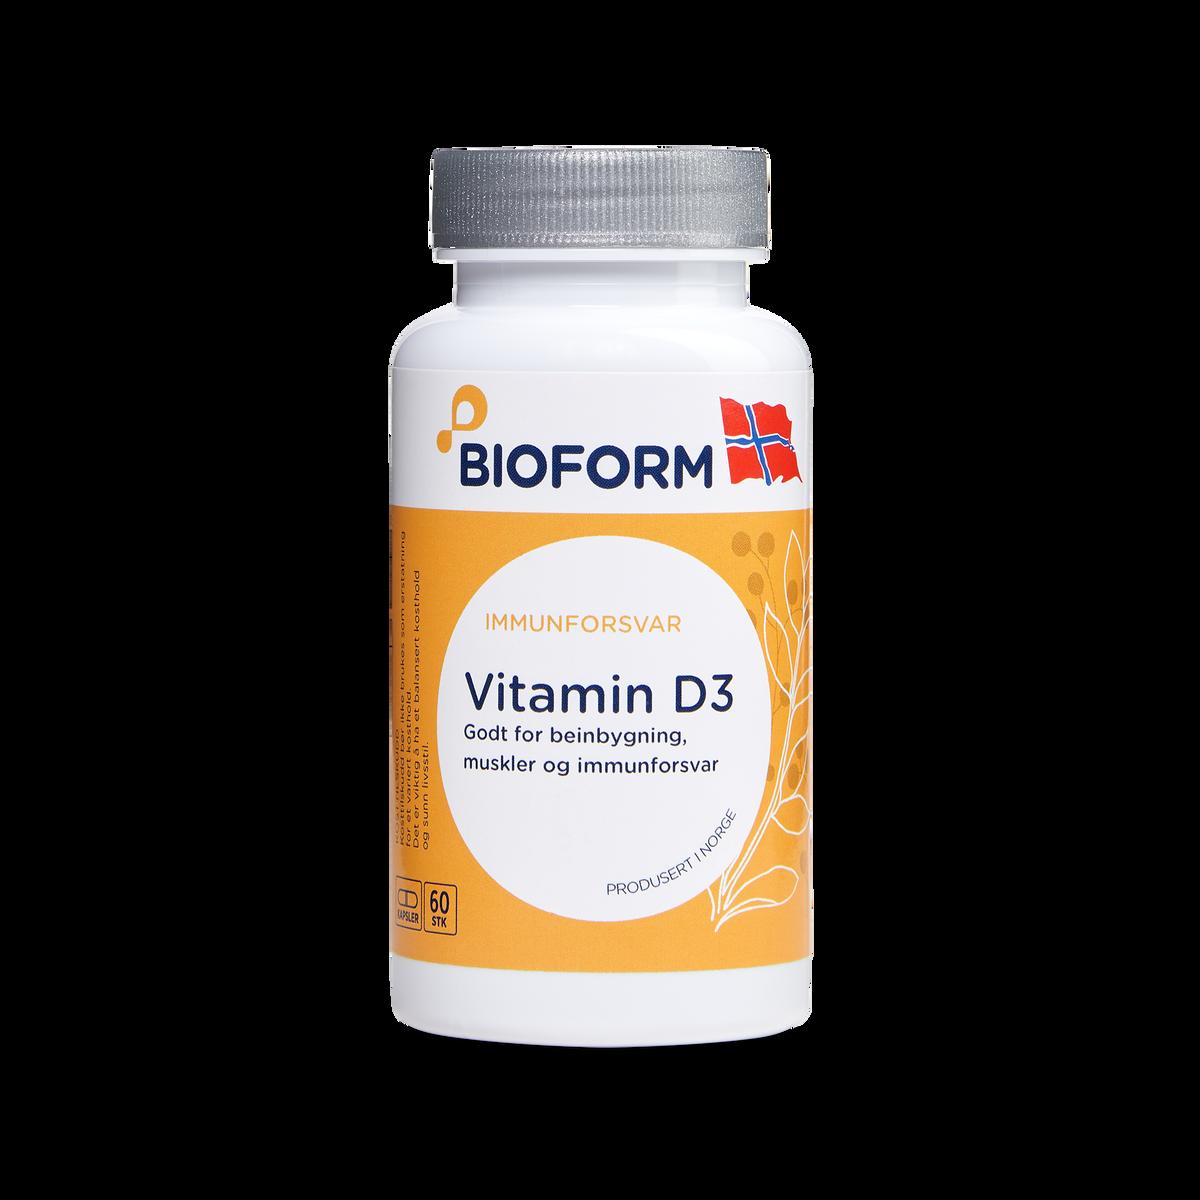 Bioform® Vitamin D3